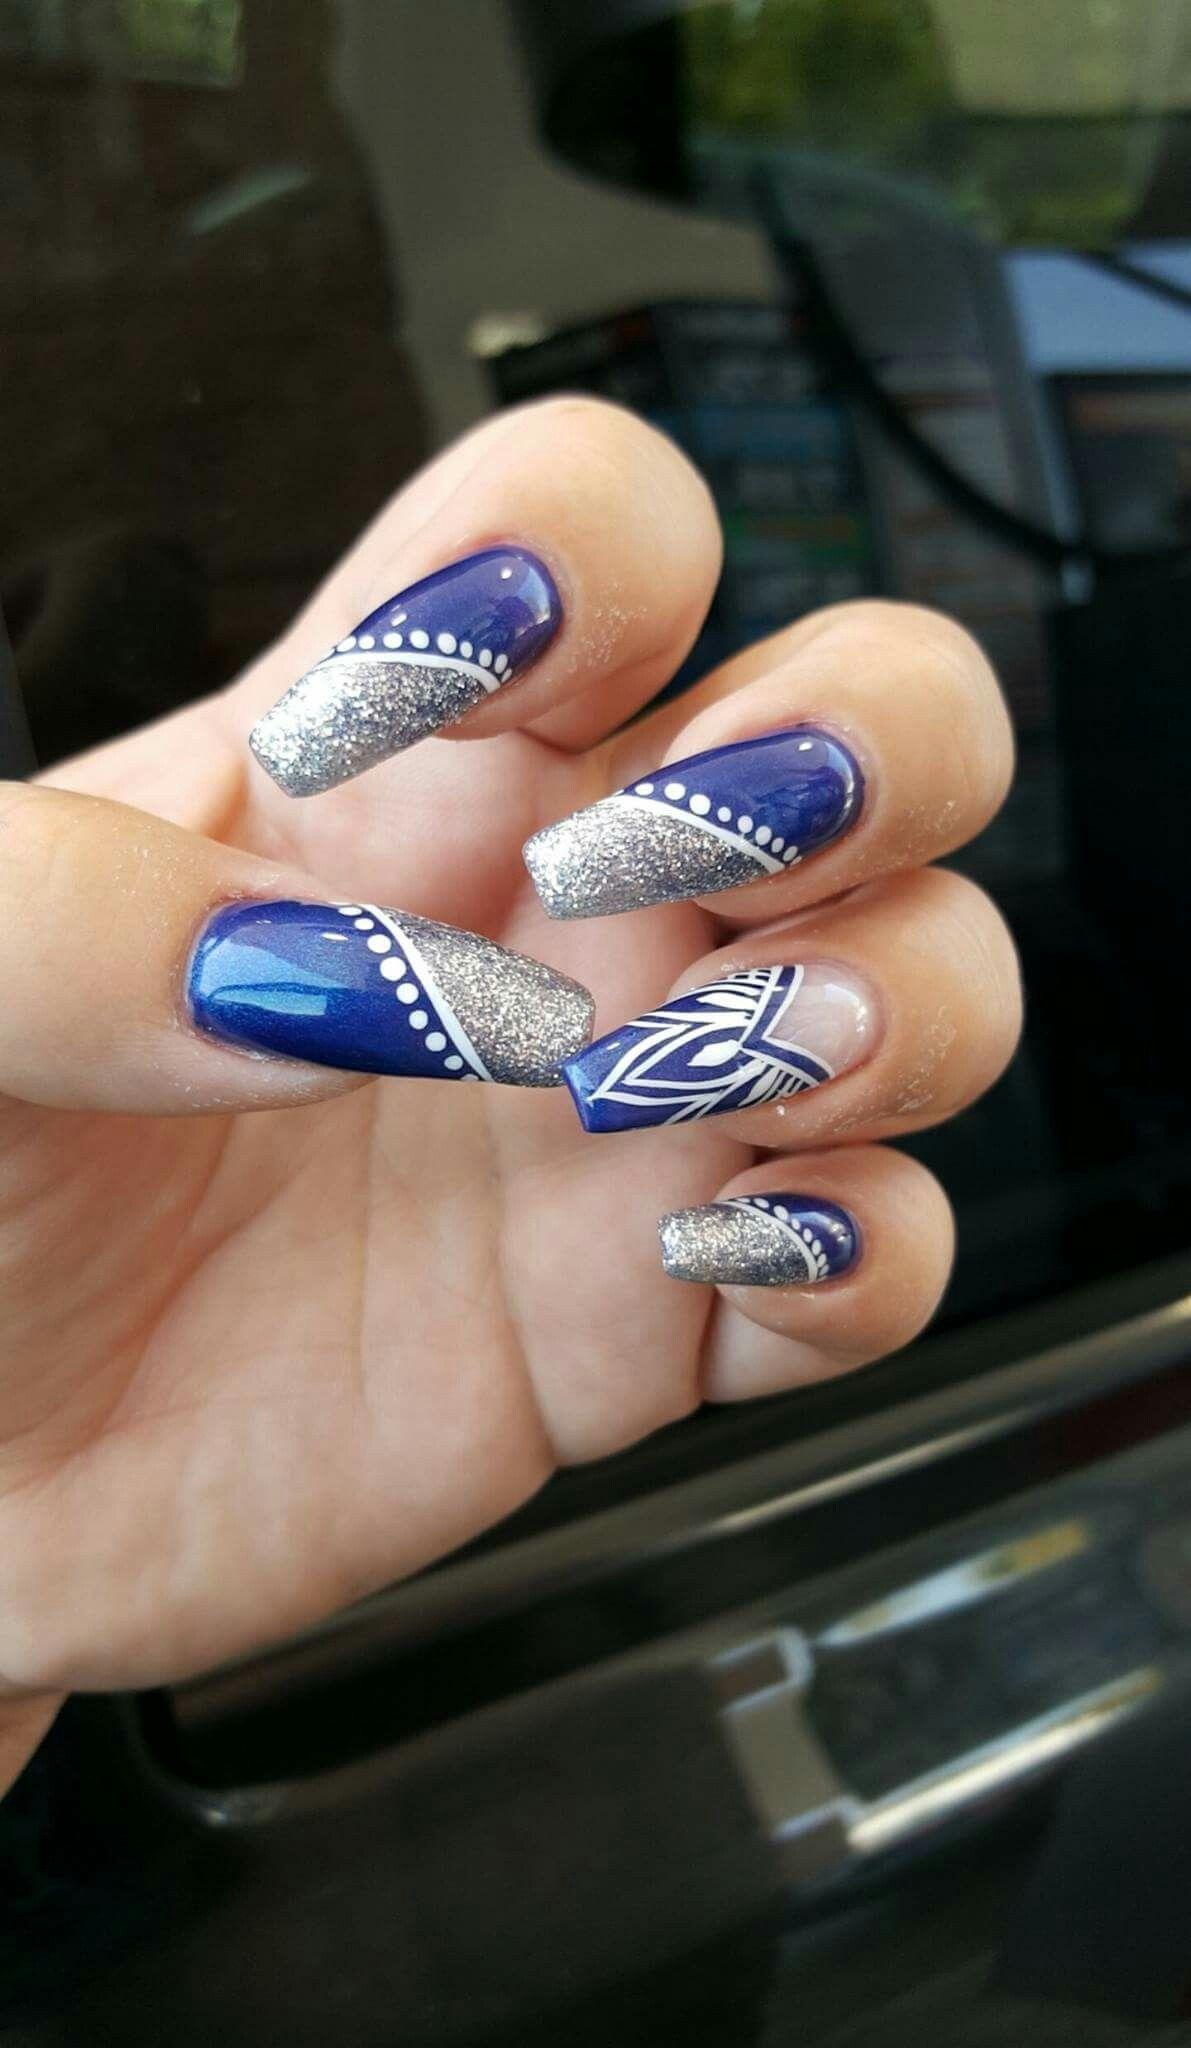 Dallas Cowboys colors | nails | Pinterest | Dallas, Cowboys and ...